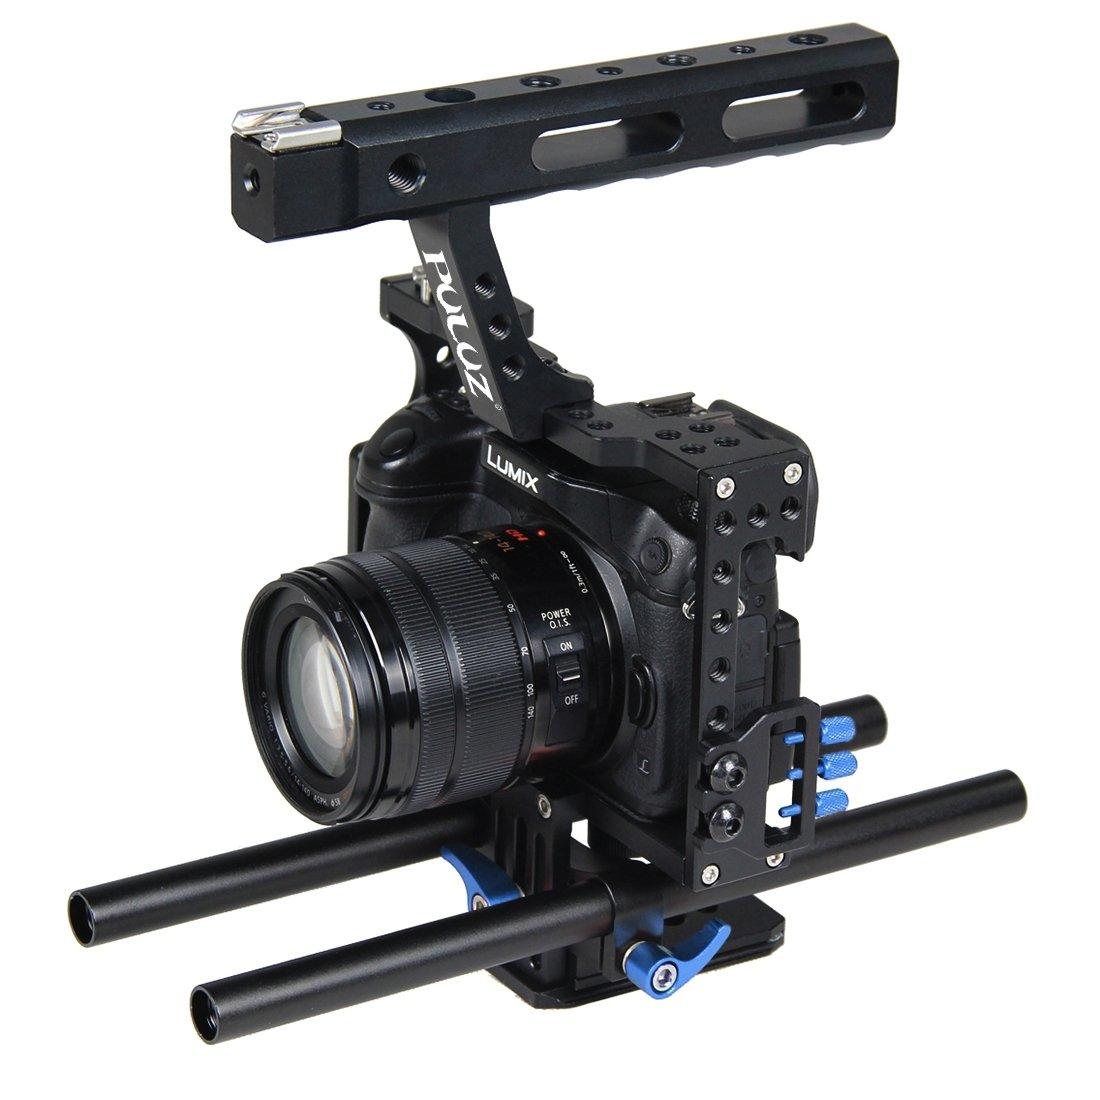 WTYD カメラアクセサリー ソニーA7&A7S&A7R&A7R II&A7S II、パナソニックLumix DMC-GH4(オレンジ)用PULUZカメラケージハンドルスタビライザー カメラ用 (Color : Blue)   B07NY8HMZ1